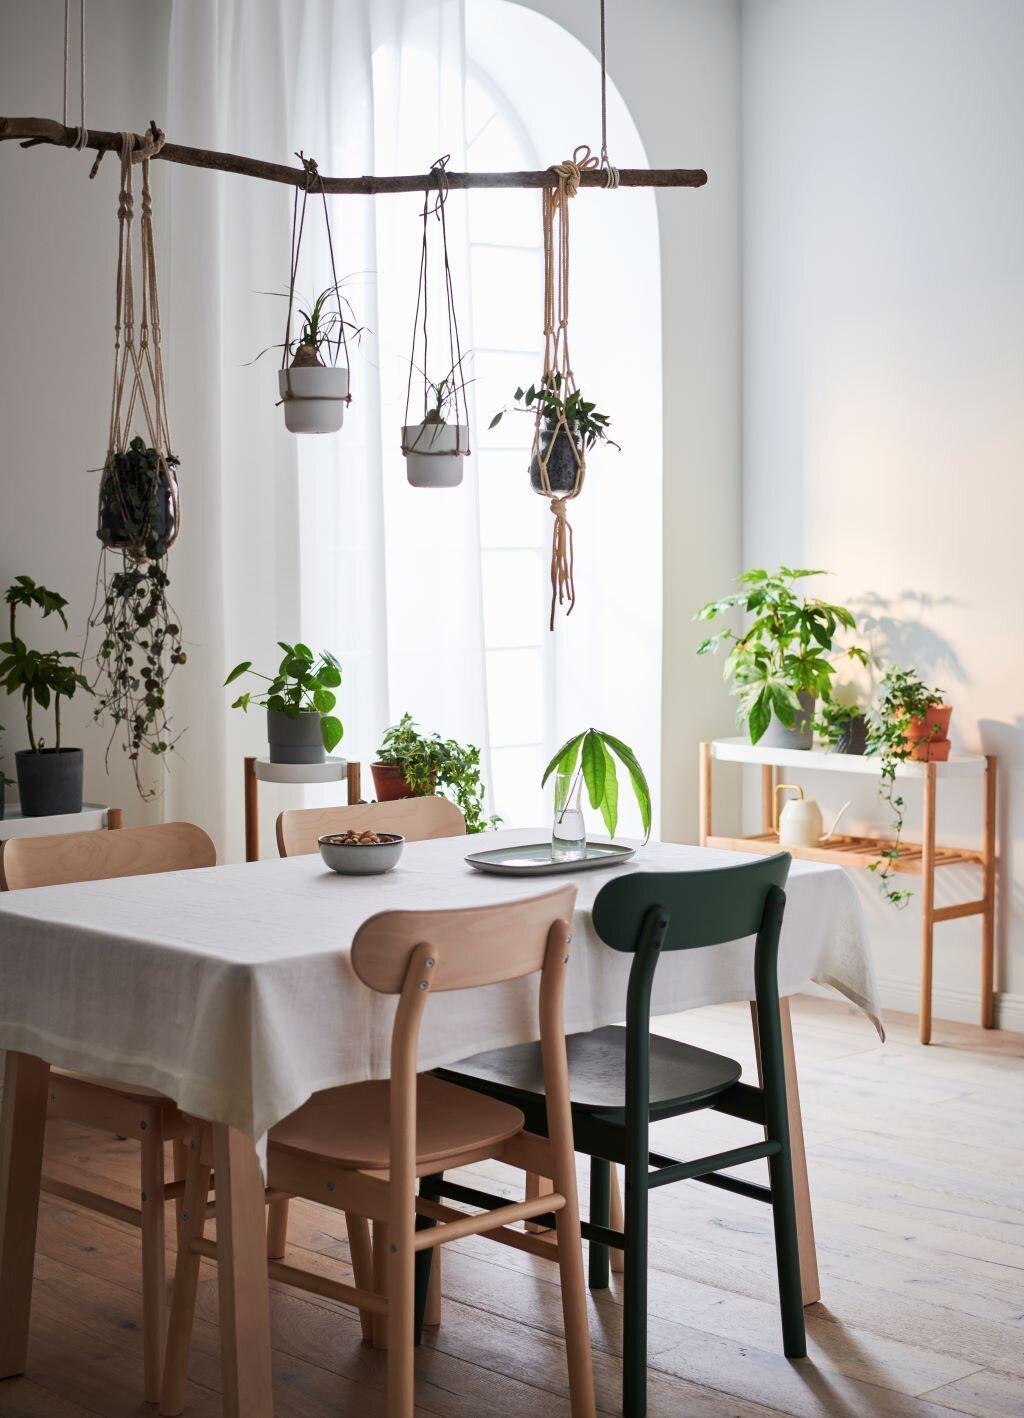 scandinavian-interior-decor-tips-ikea-hanging-planters-table